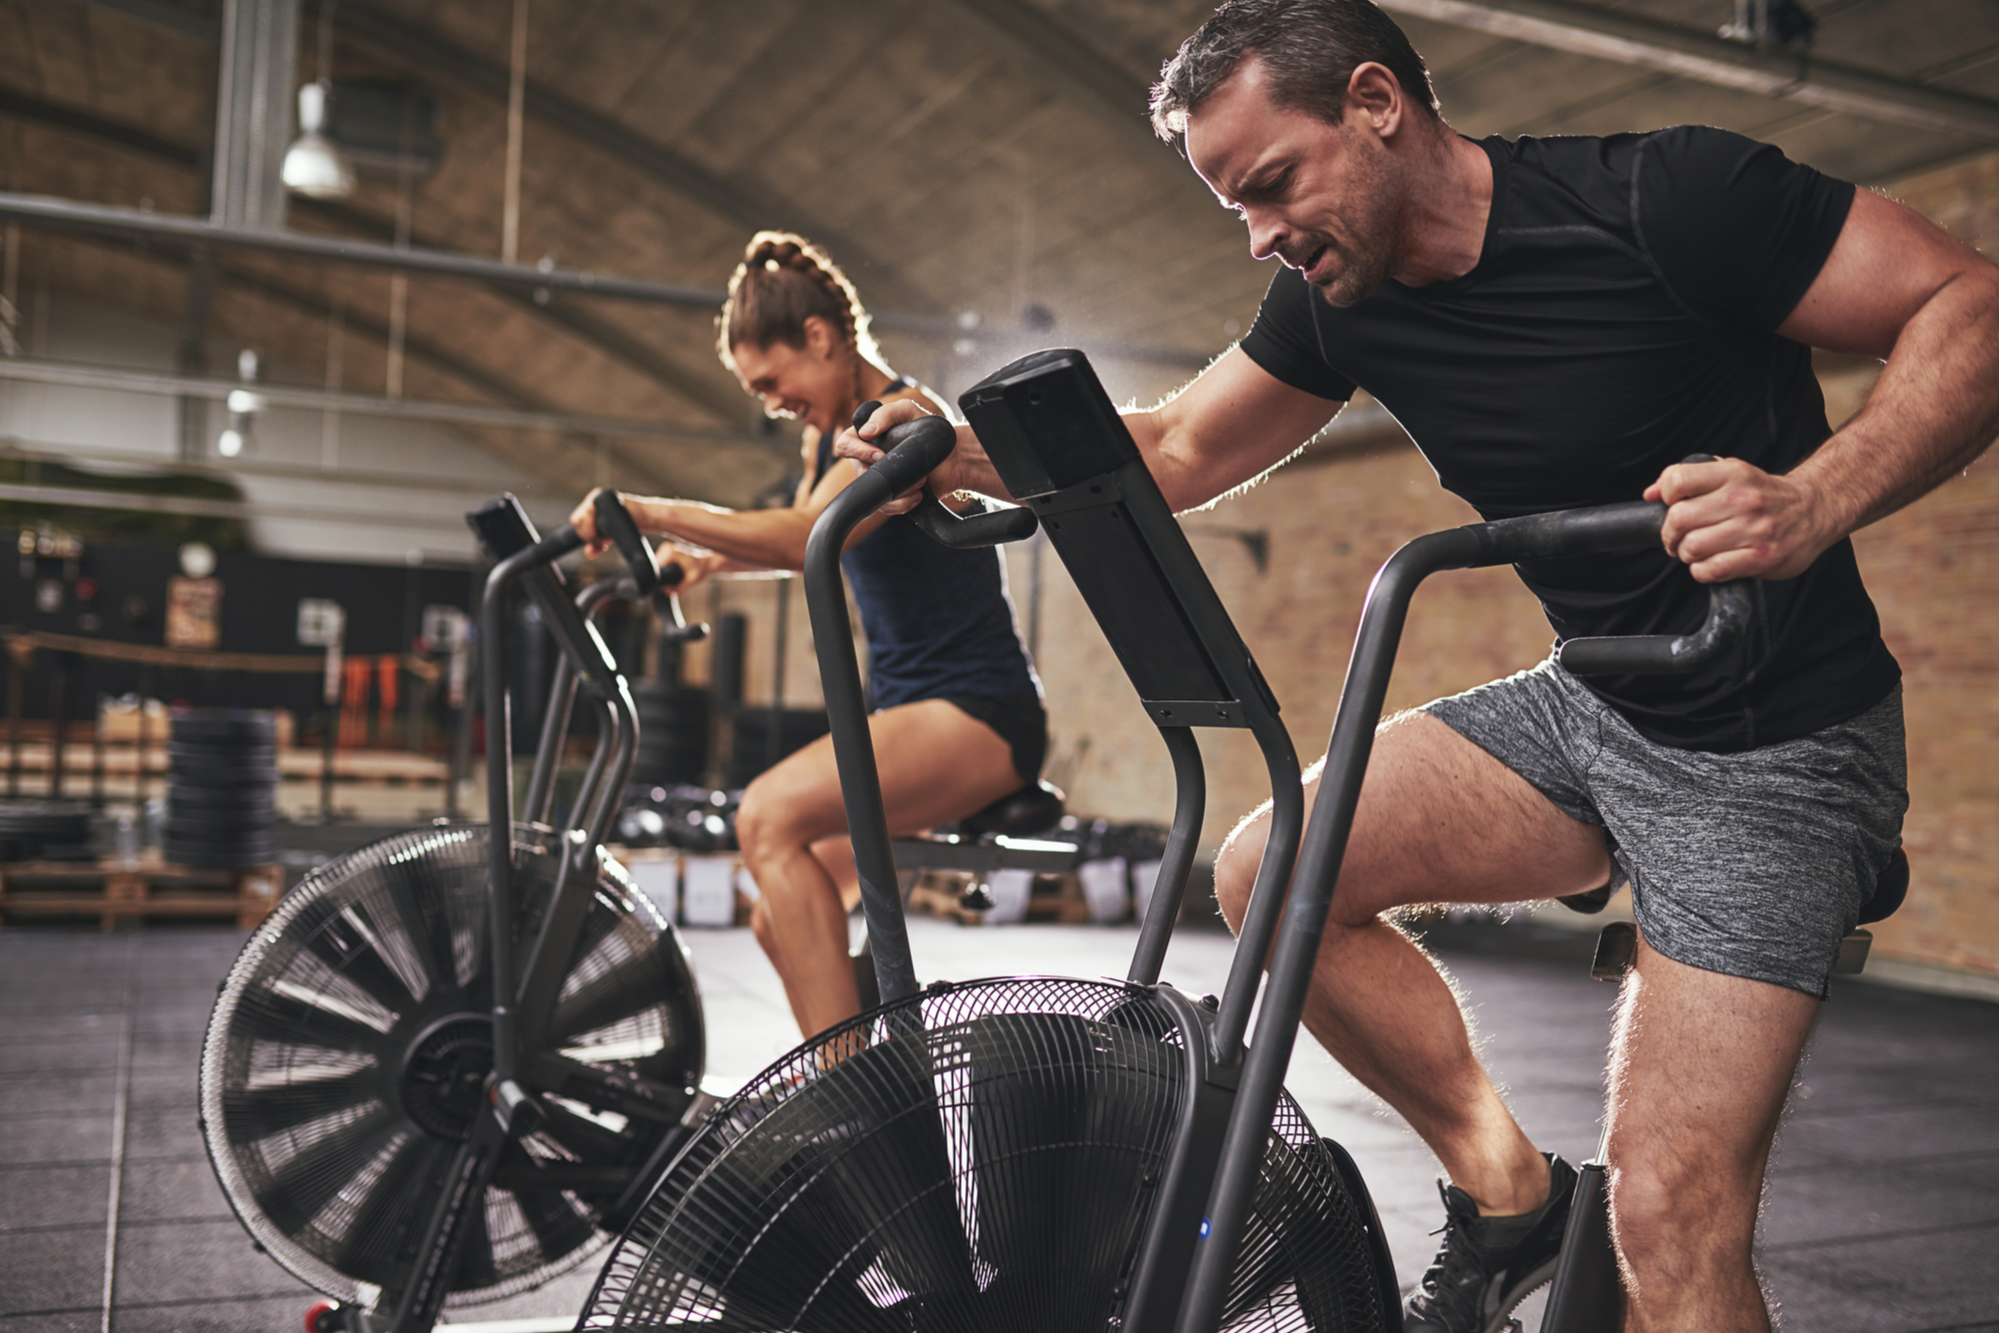 beta alanin gymgrossisten